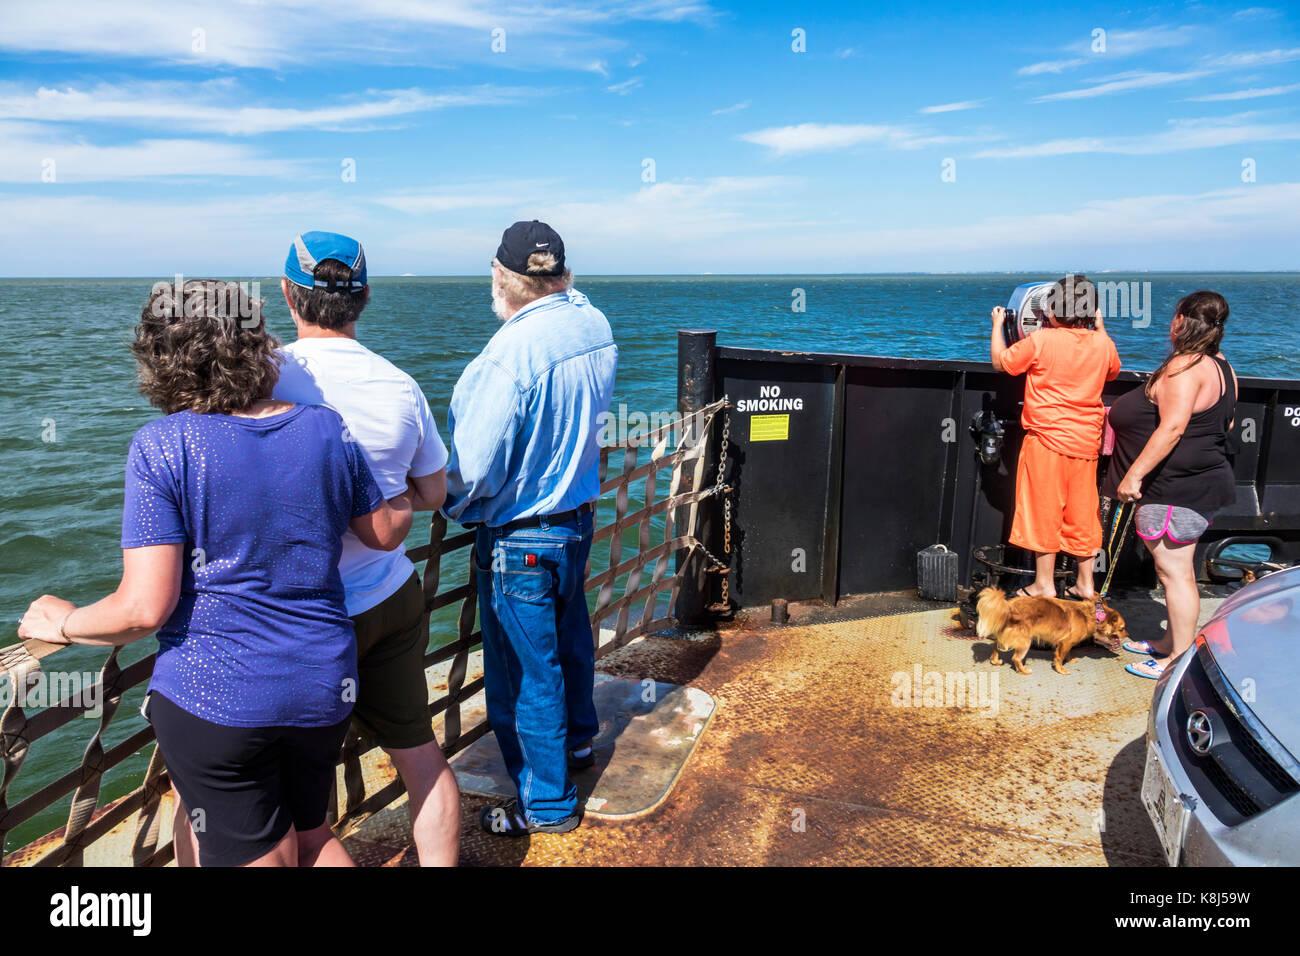 Outer Banks North Carolina NC Pamlico Sound Ocracoke Island Hatteras ferry water passengers horizon - Stock Image